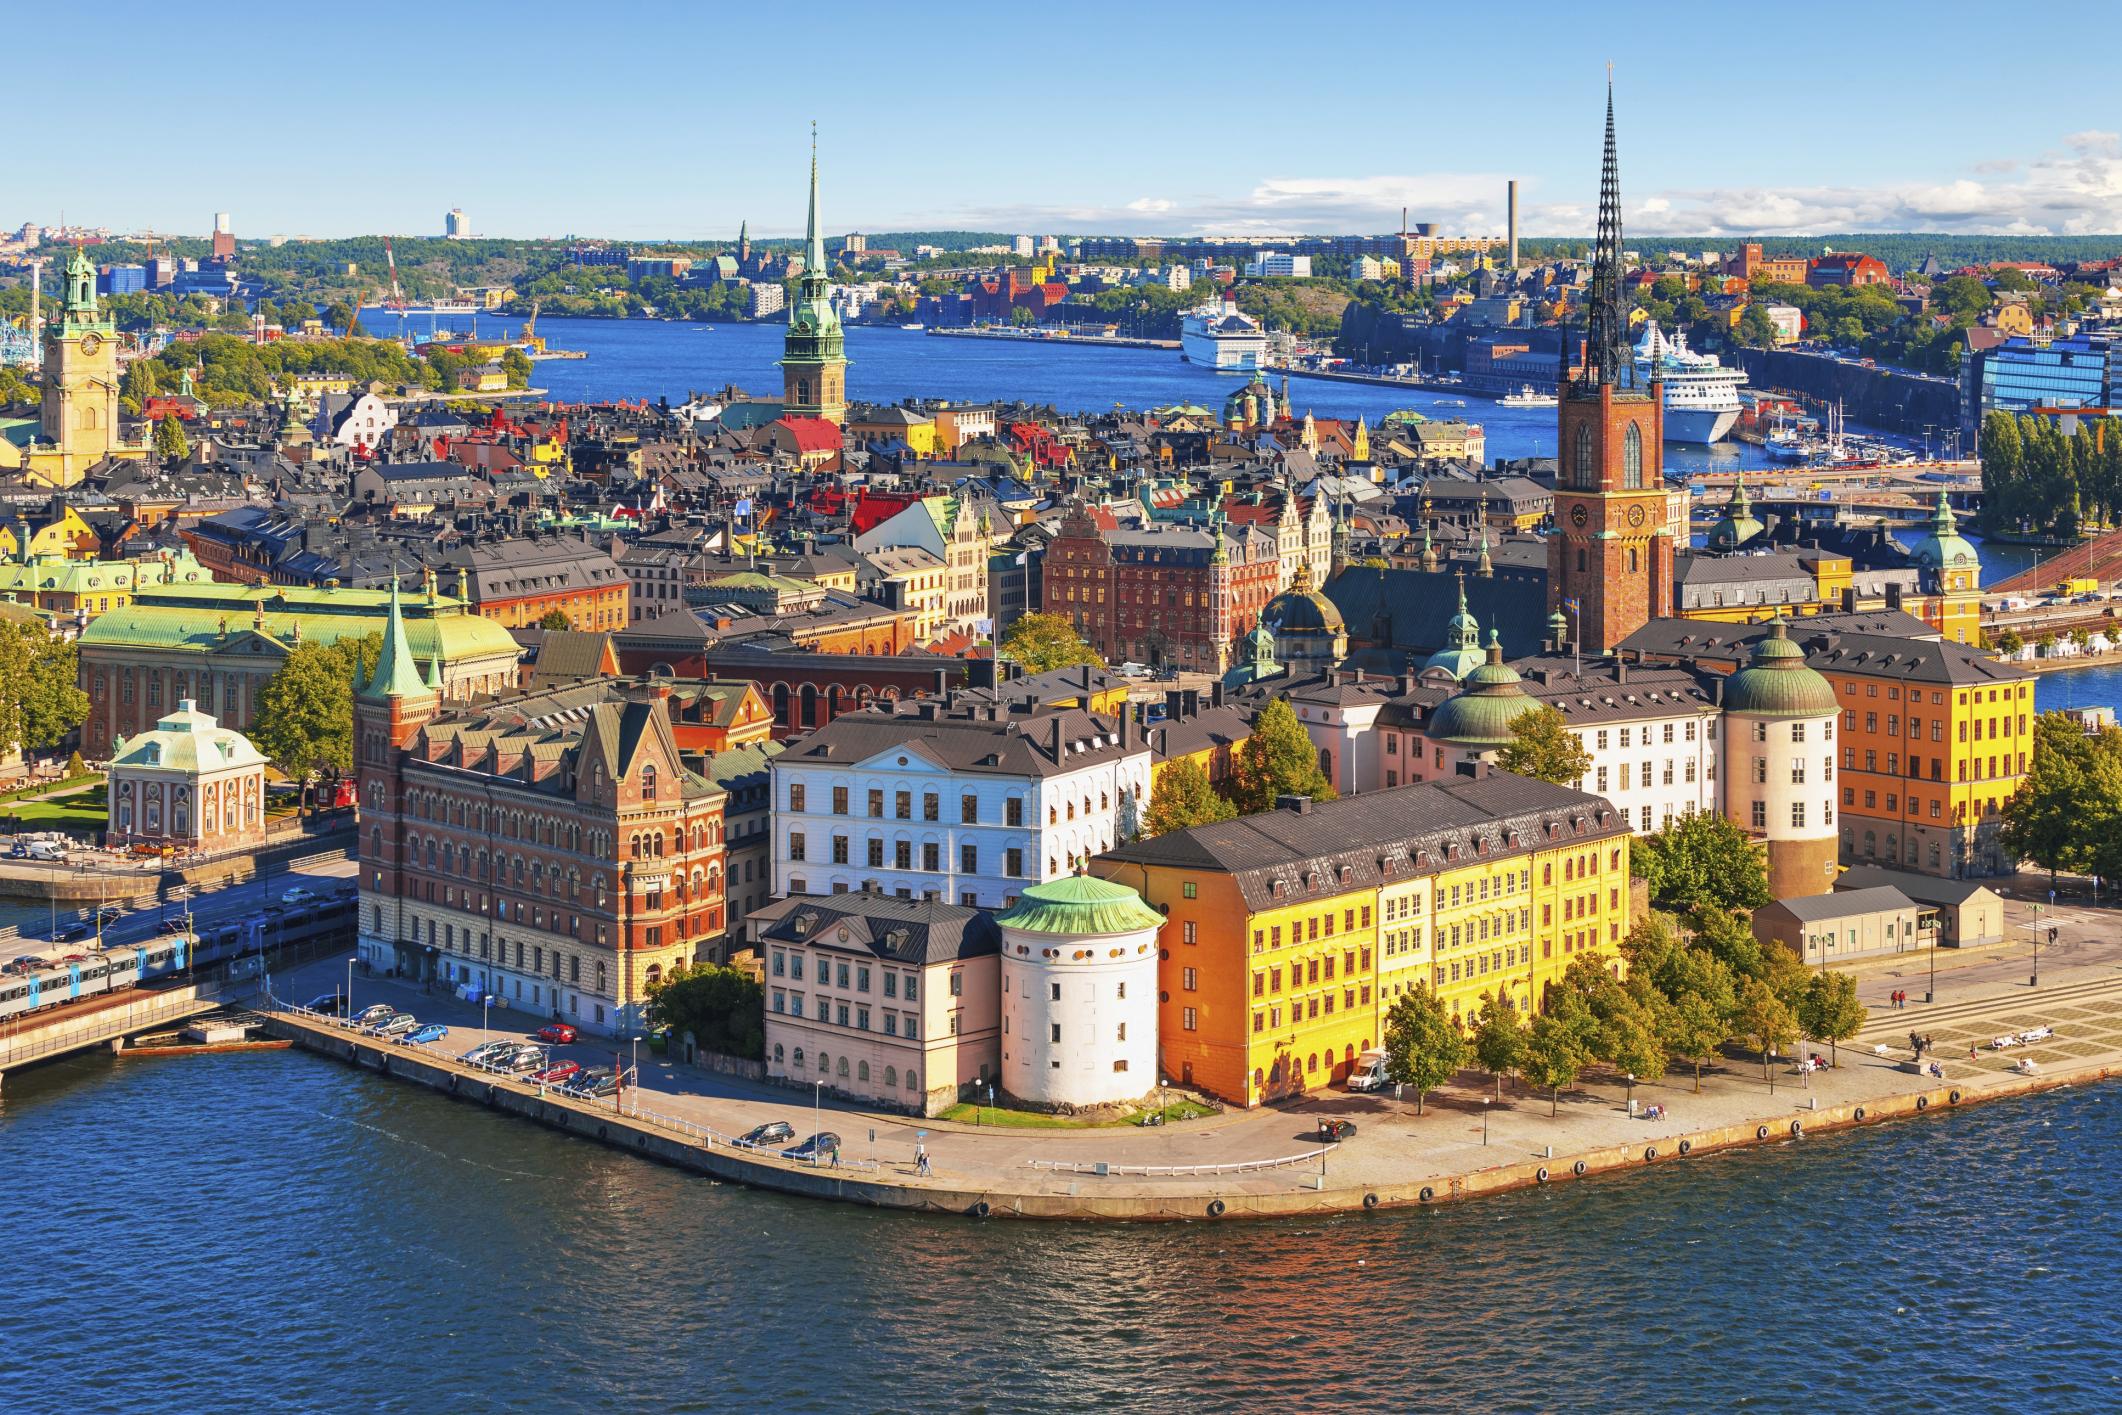 Top 15 Nahtavyydet Tukholma Skyscanner Suomi